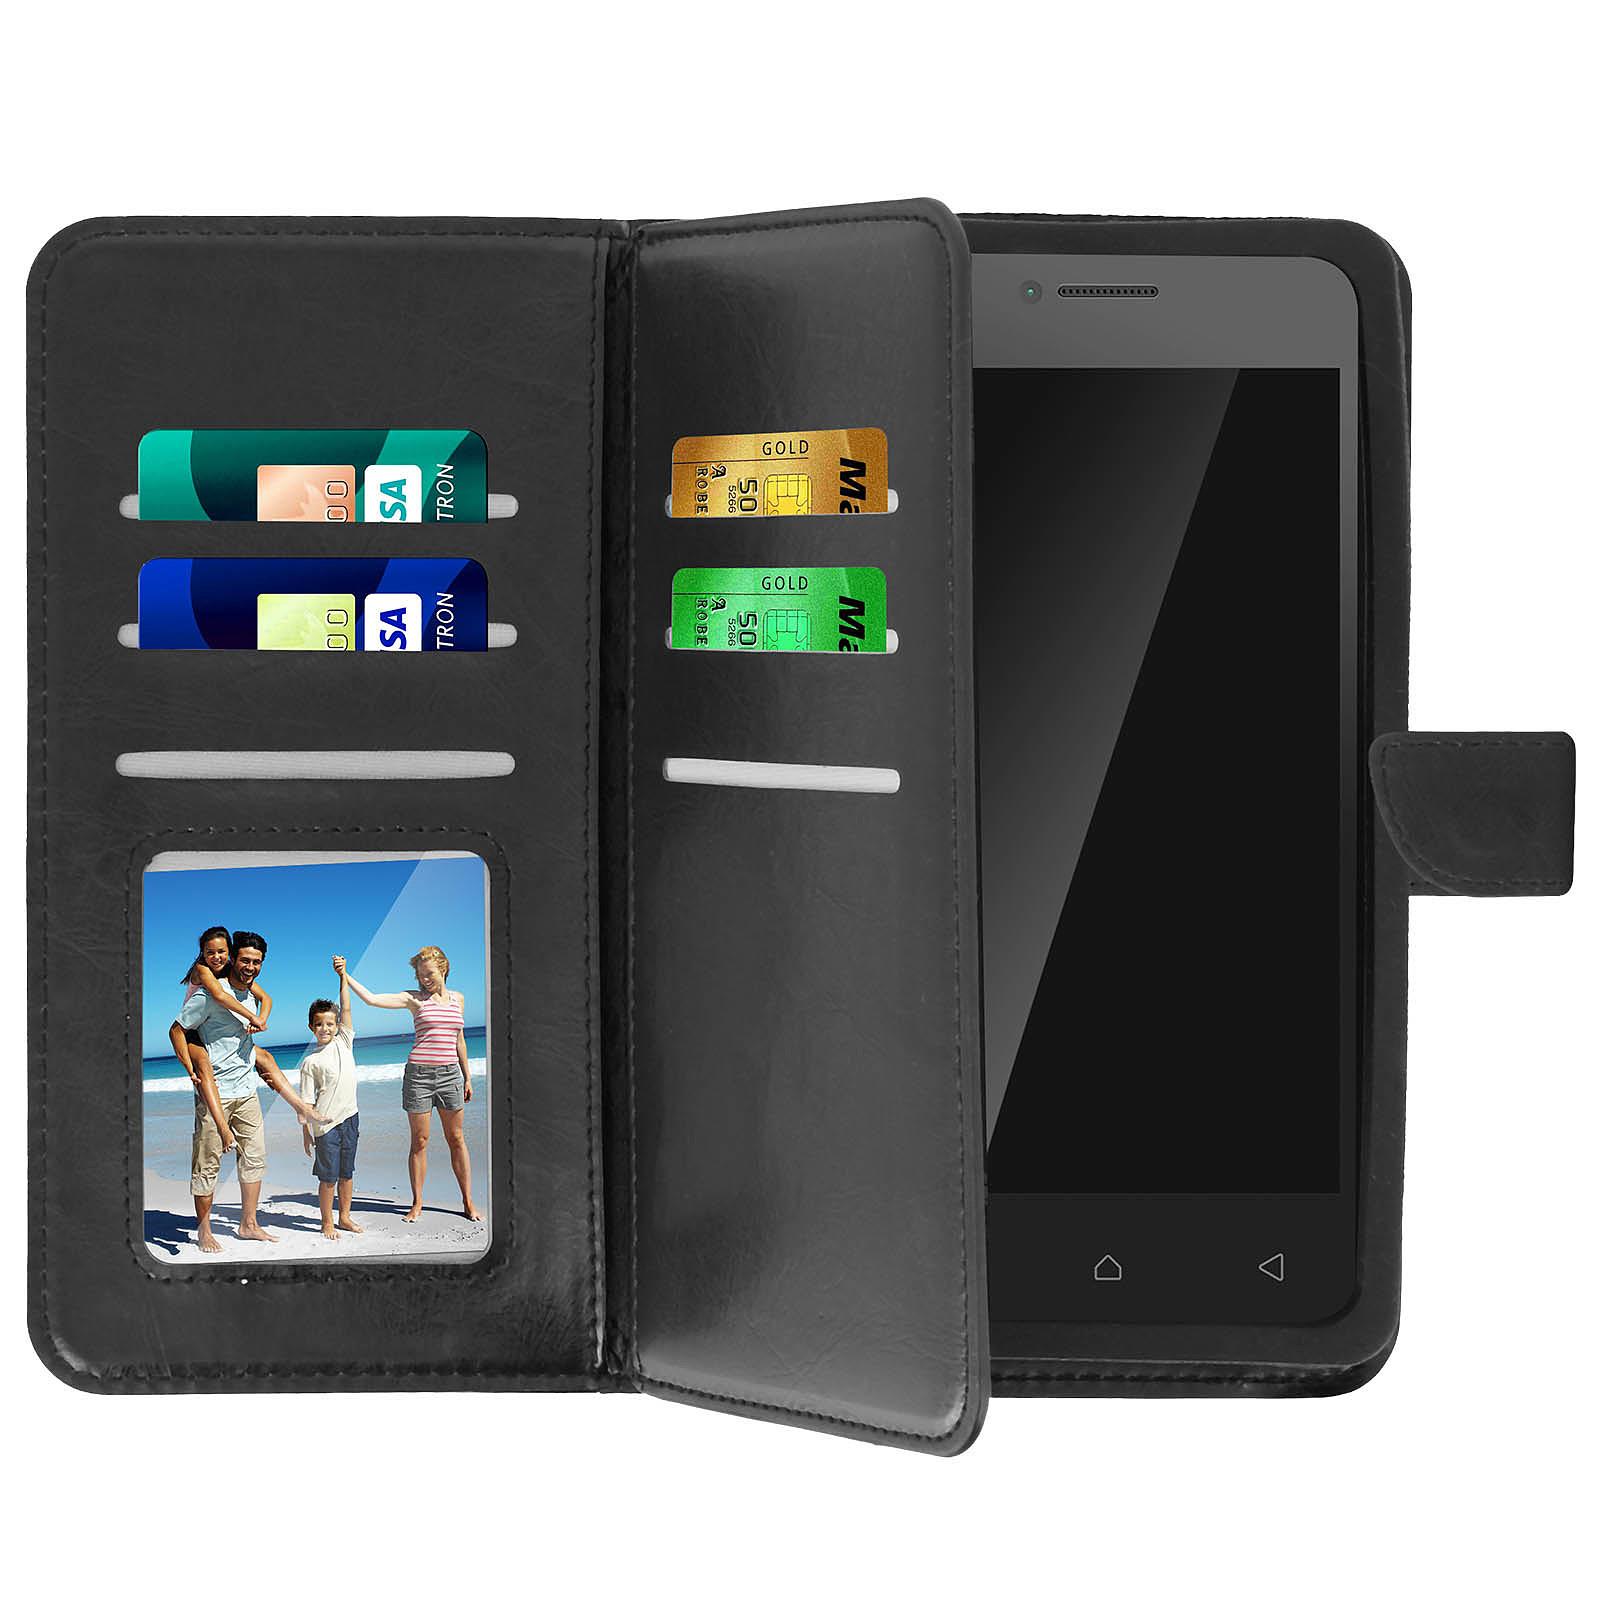 Avizar Etui folio Noir pour Smartphones de 5.0' à 5.3'